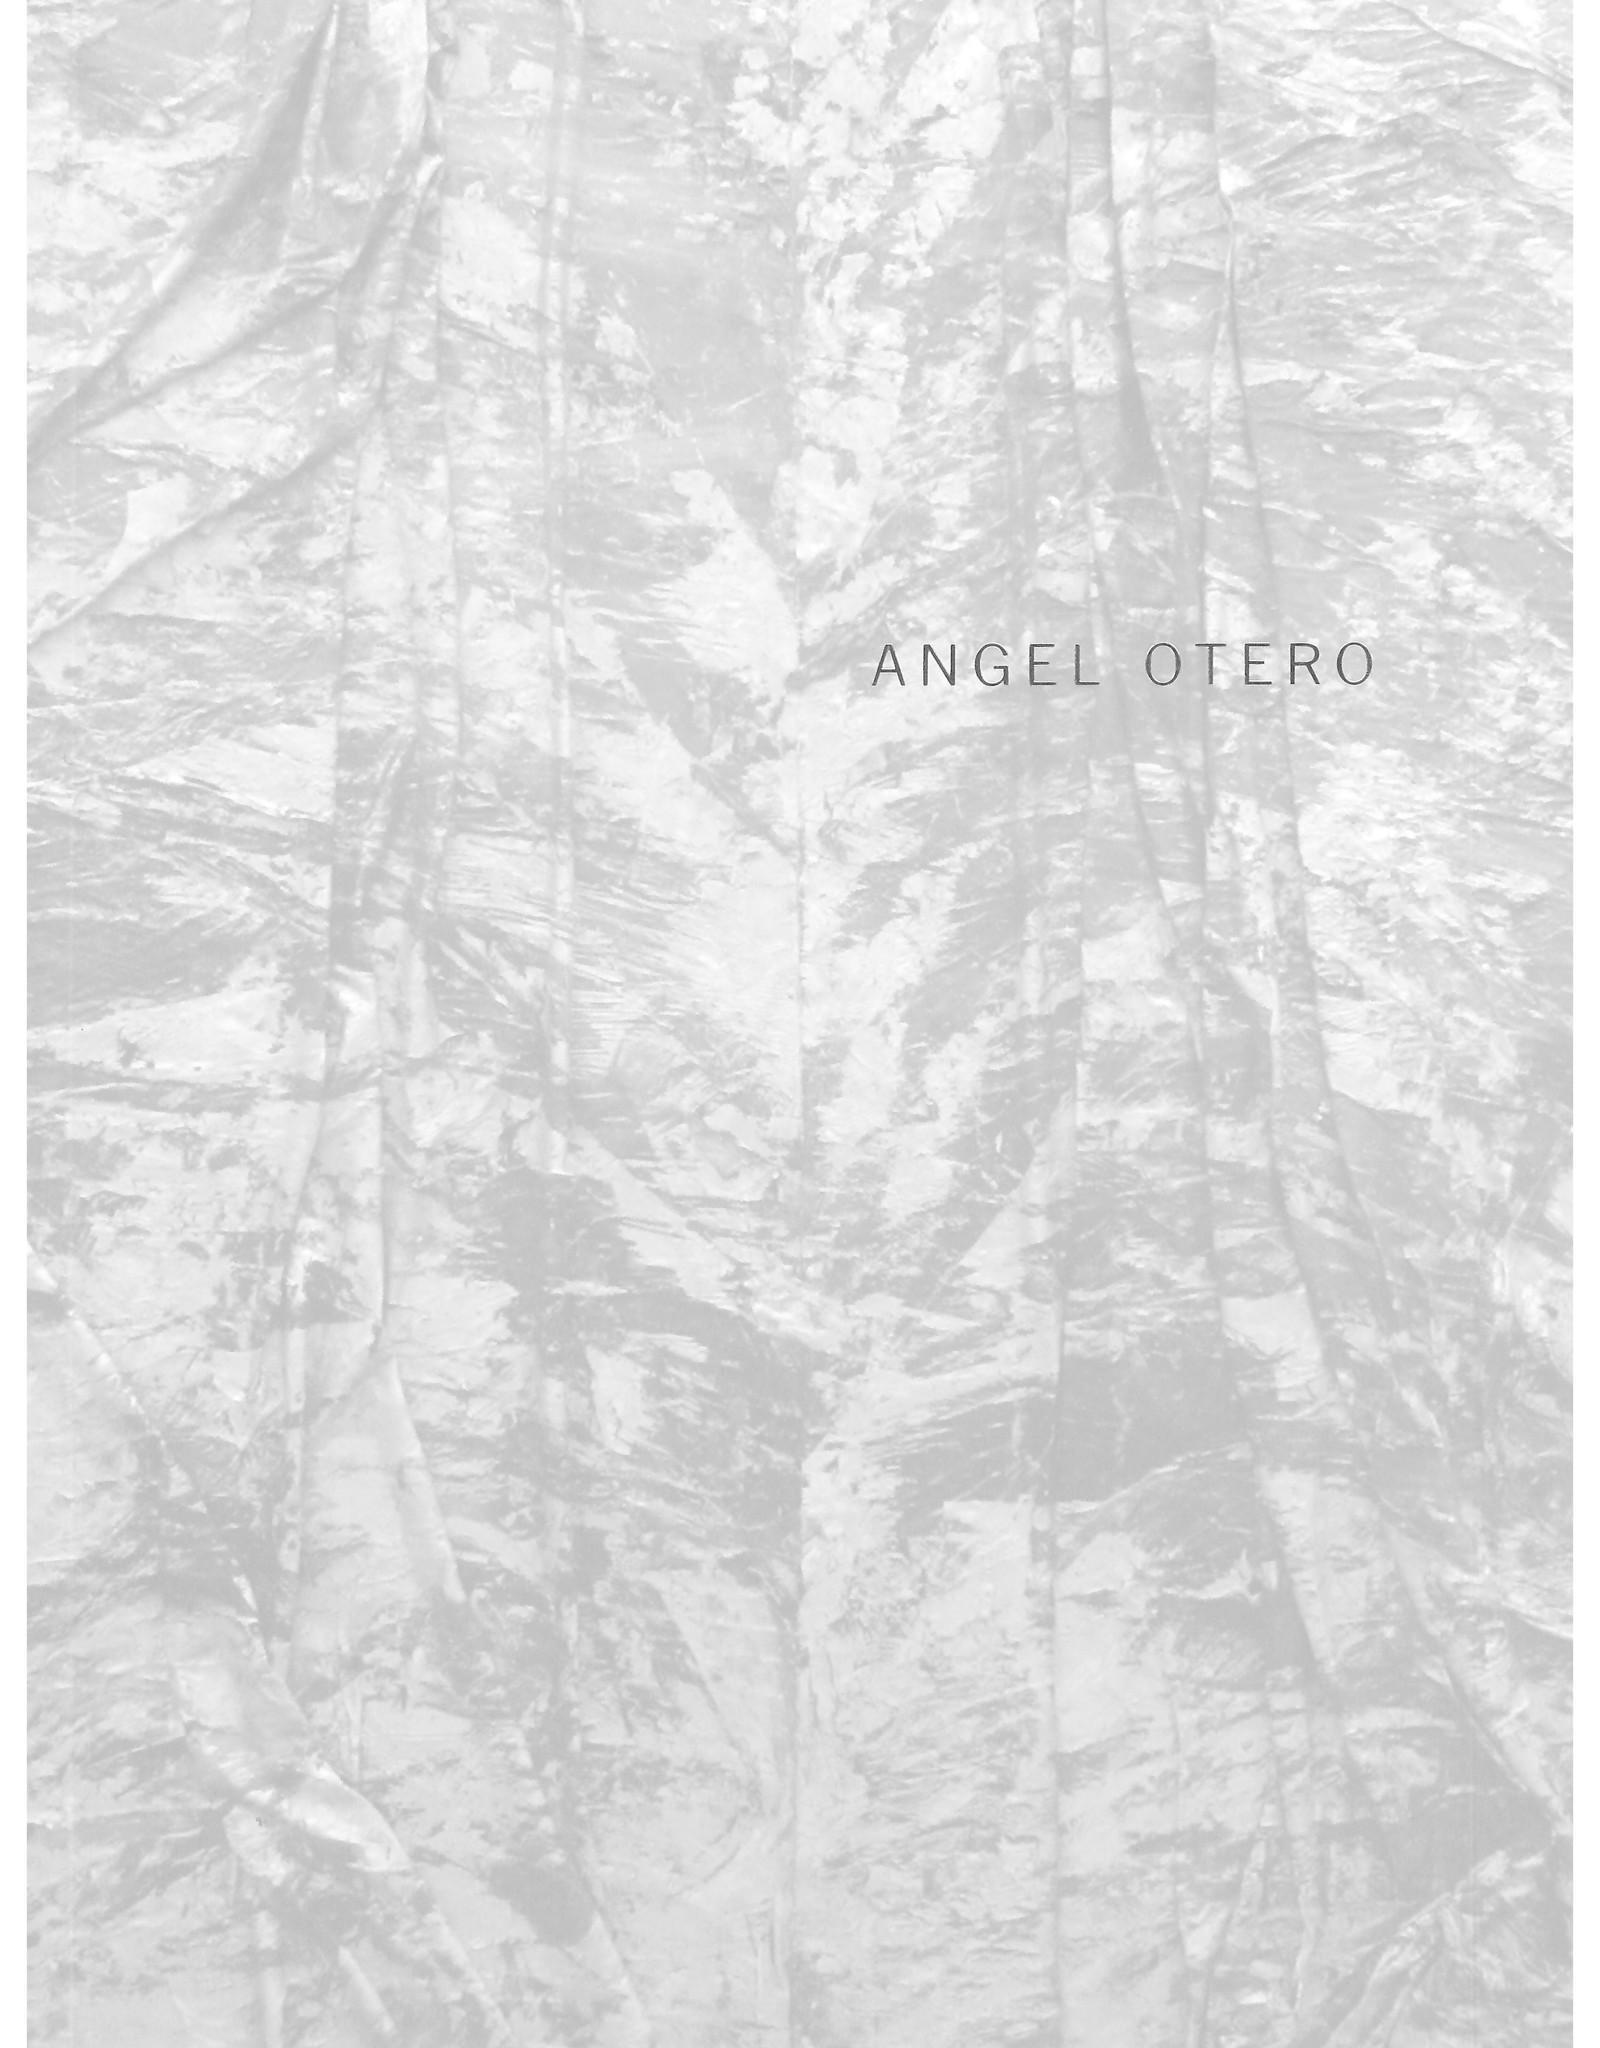 Angel Otero